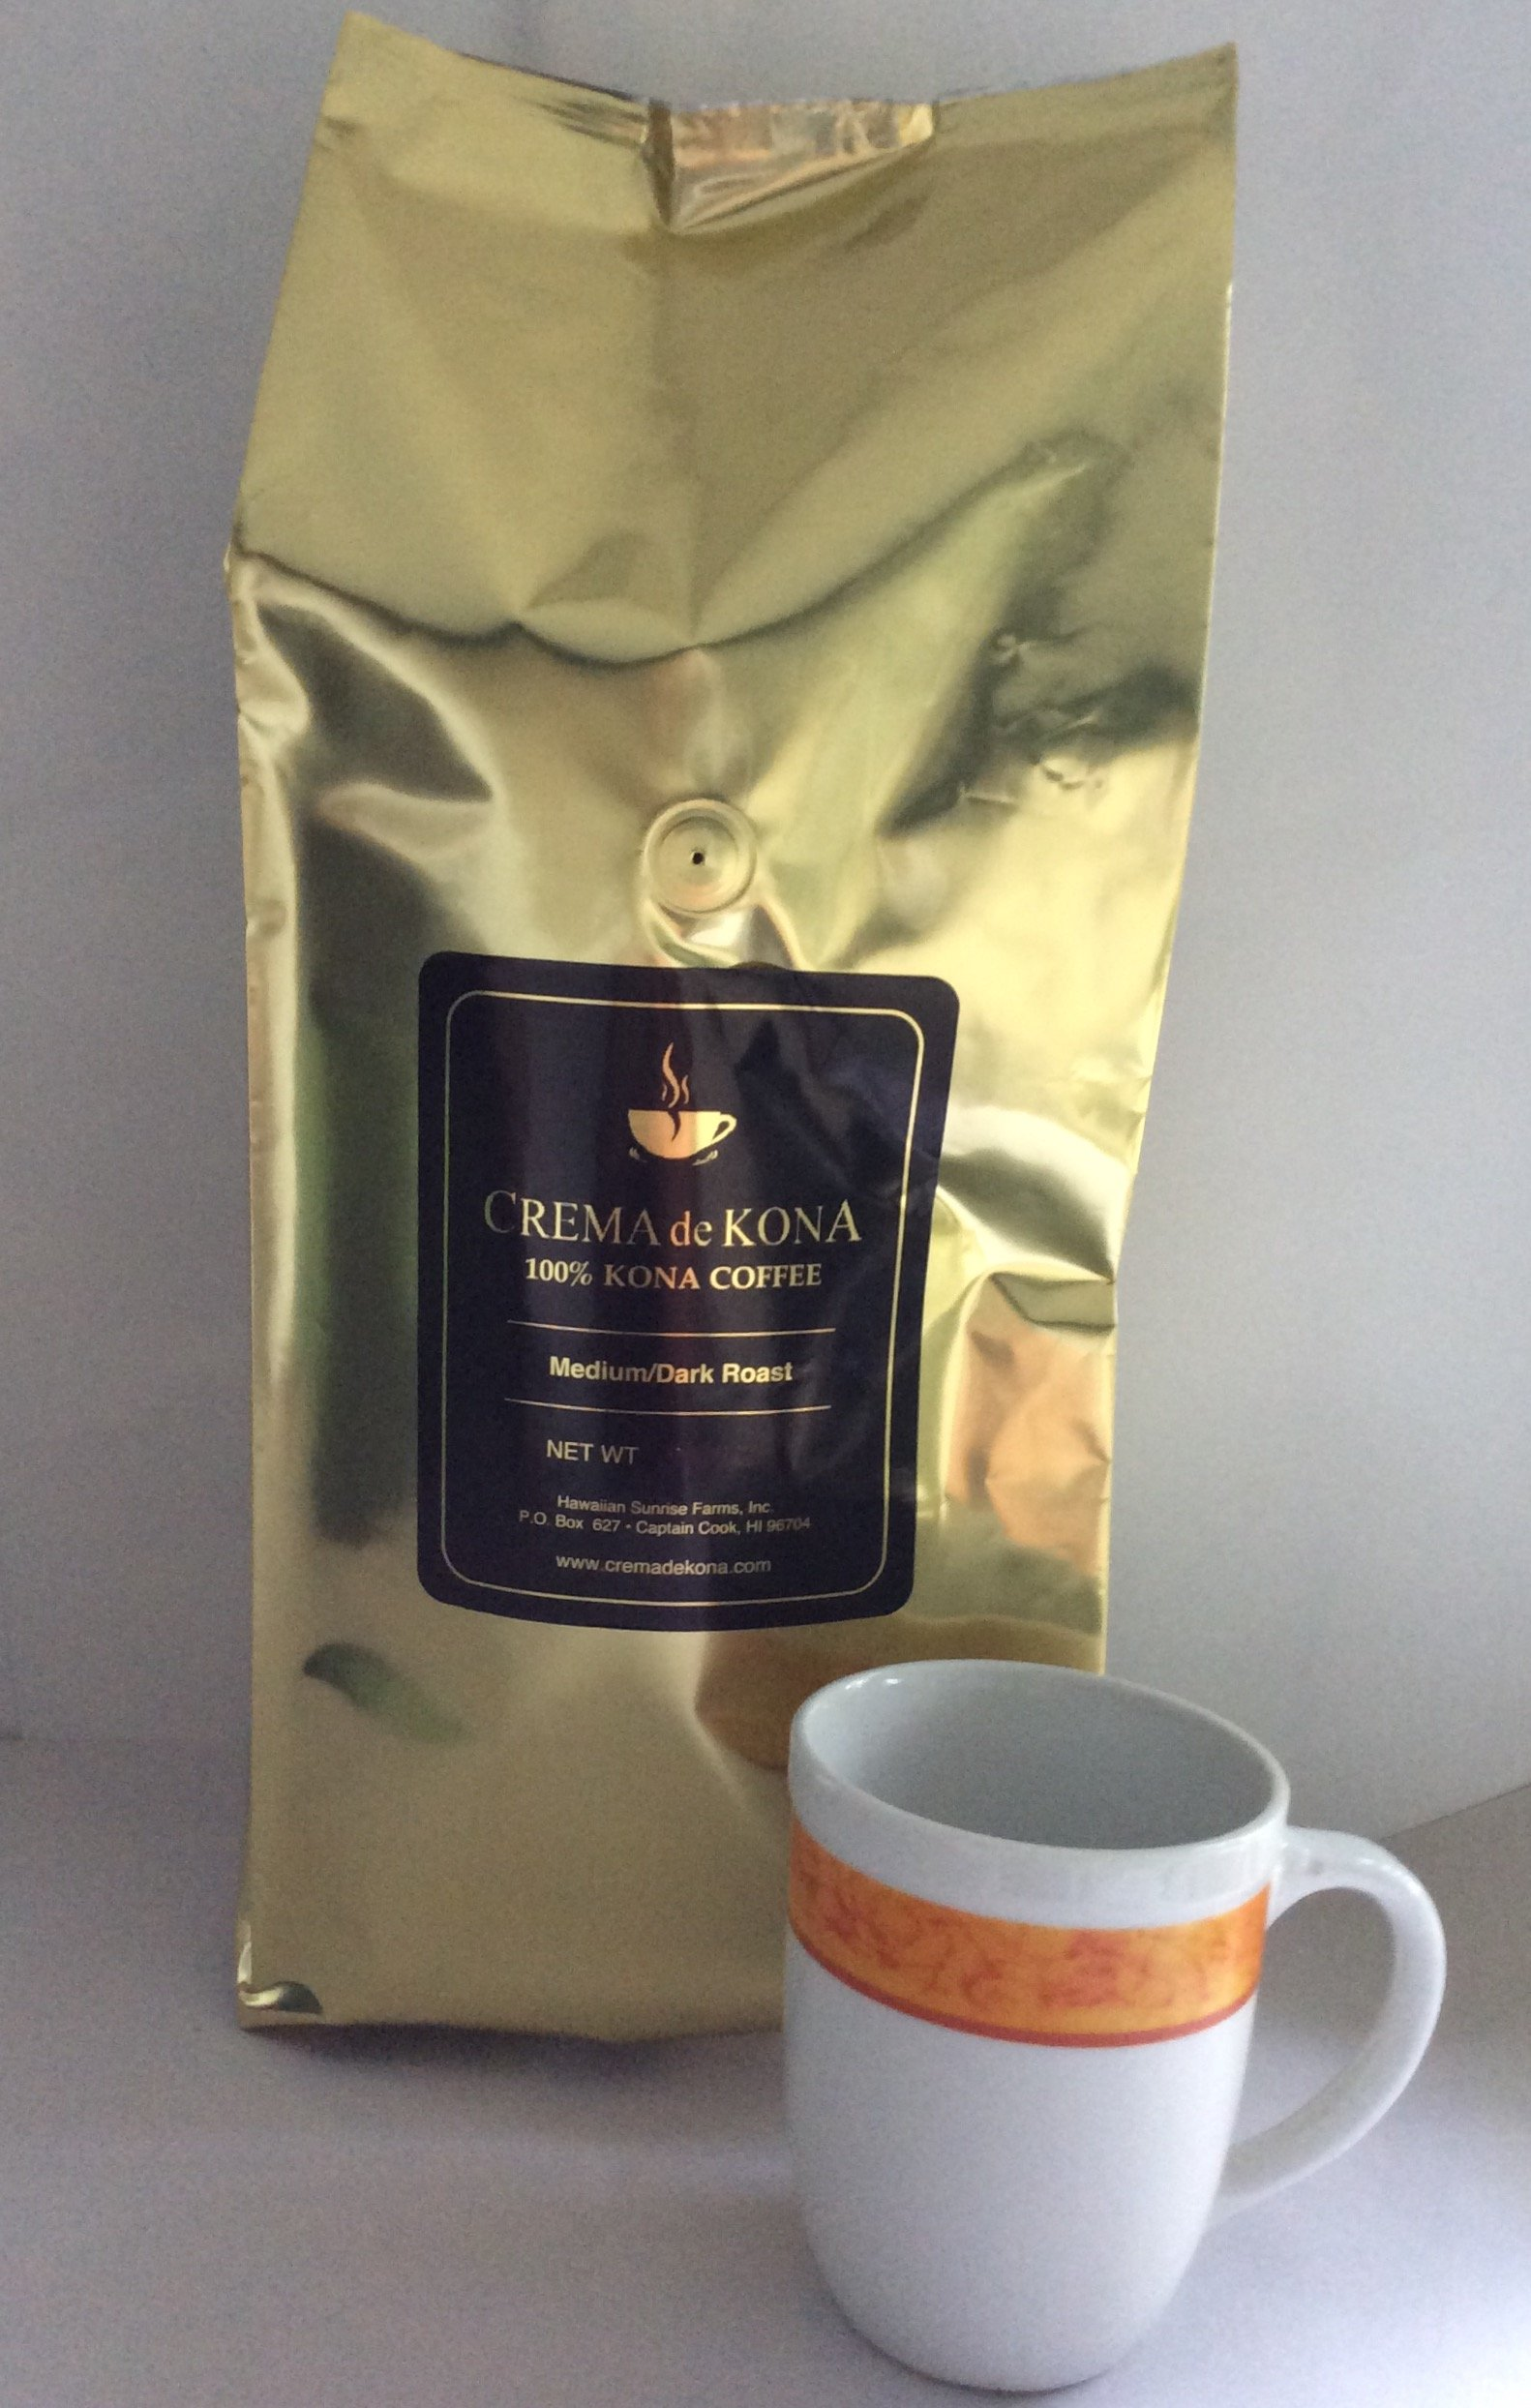 CREMA de KONA Roasted 100% Kona Coffee Beans (Medium Dark Roast, 5pound)